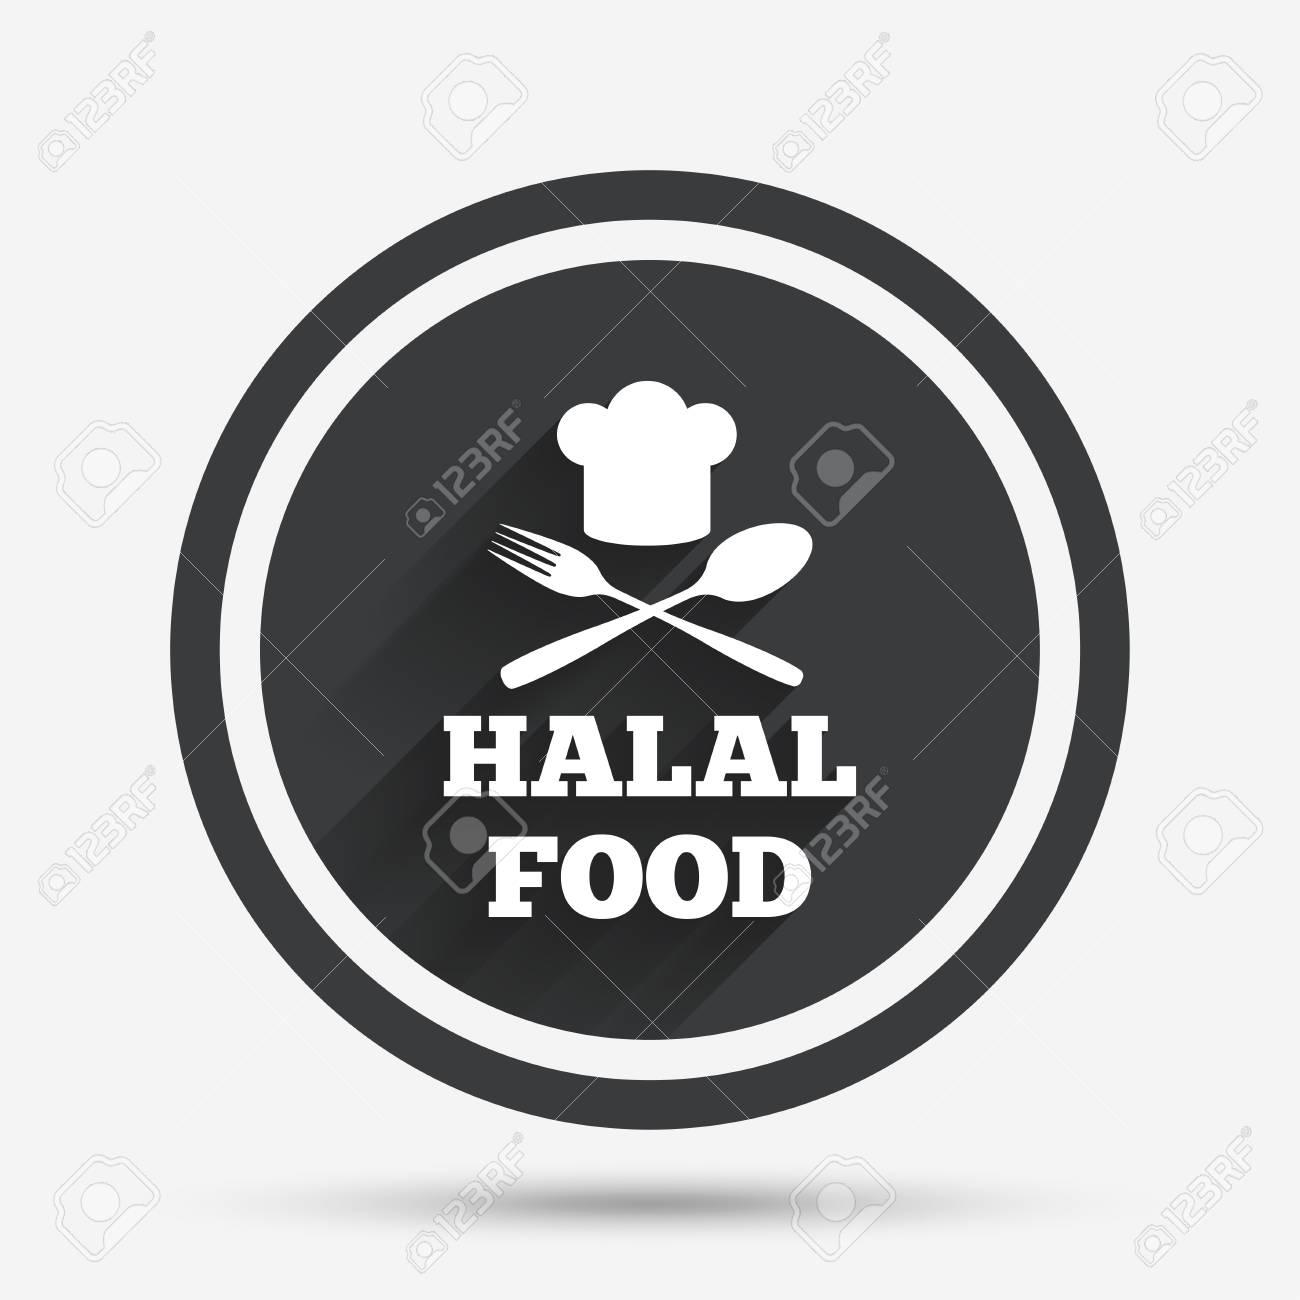 Halal symbol on food products gallery symbol and sign ideas halal food product sign icon chef hat with spoon and fork halal food product sign icon buycottarizona